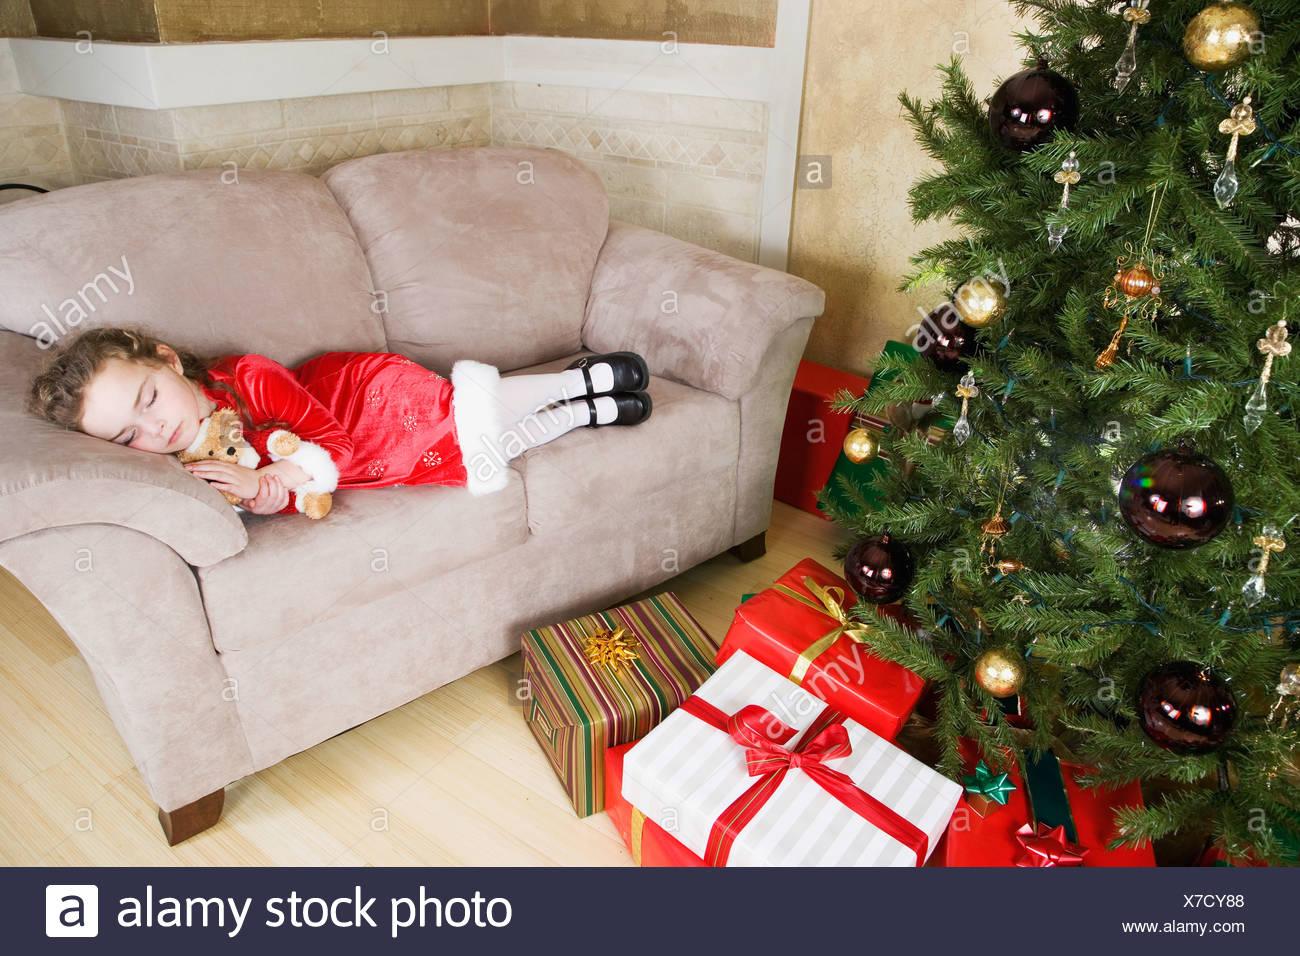 Girl (6-7) sleeping on sofa by Christmas tree Stock Photo